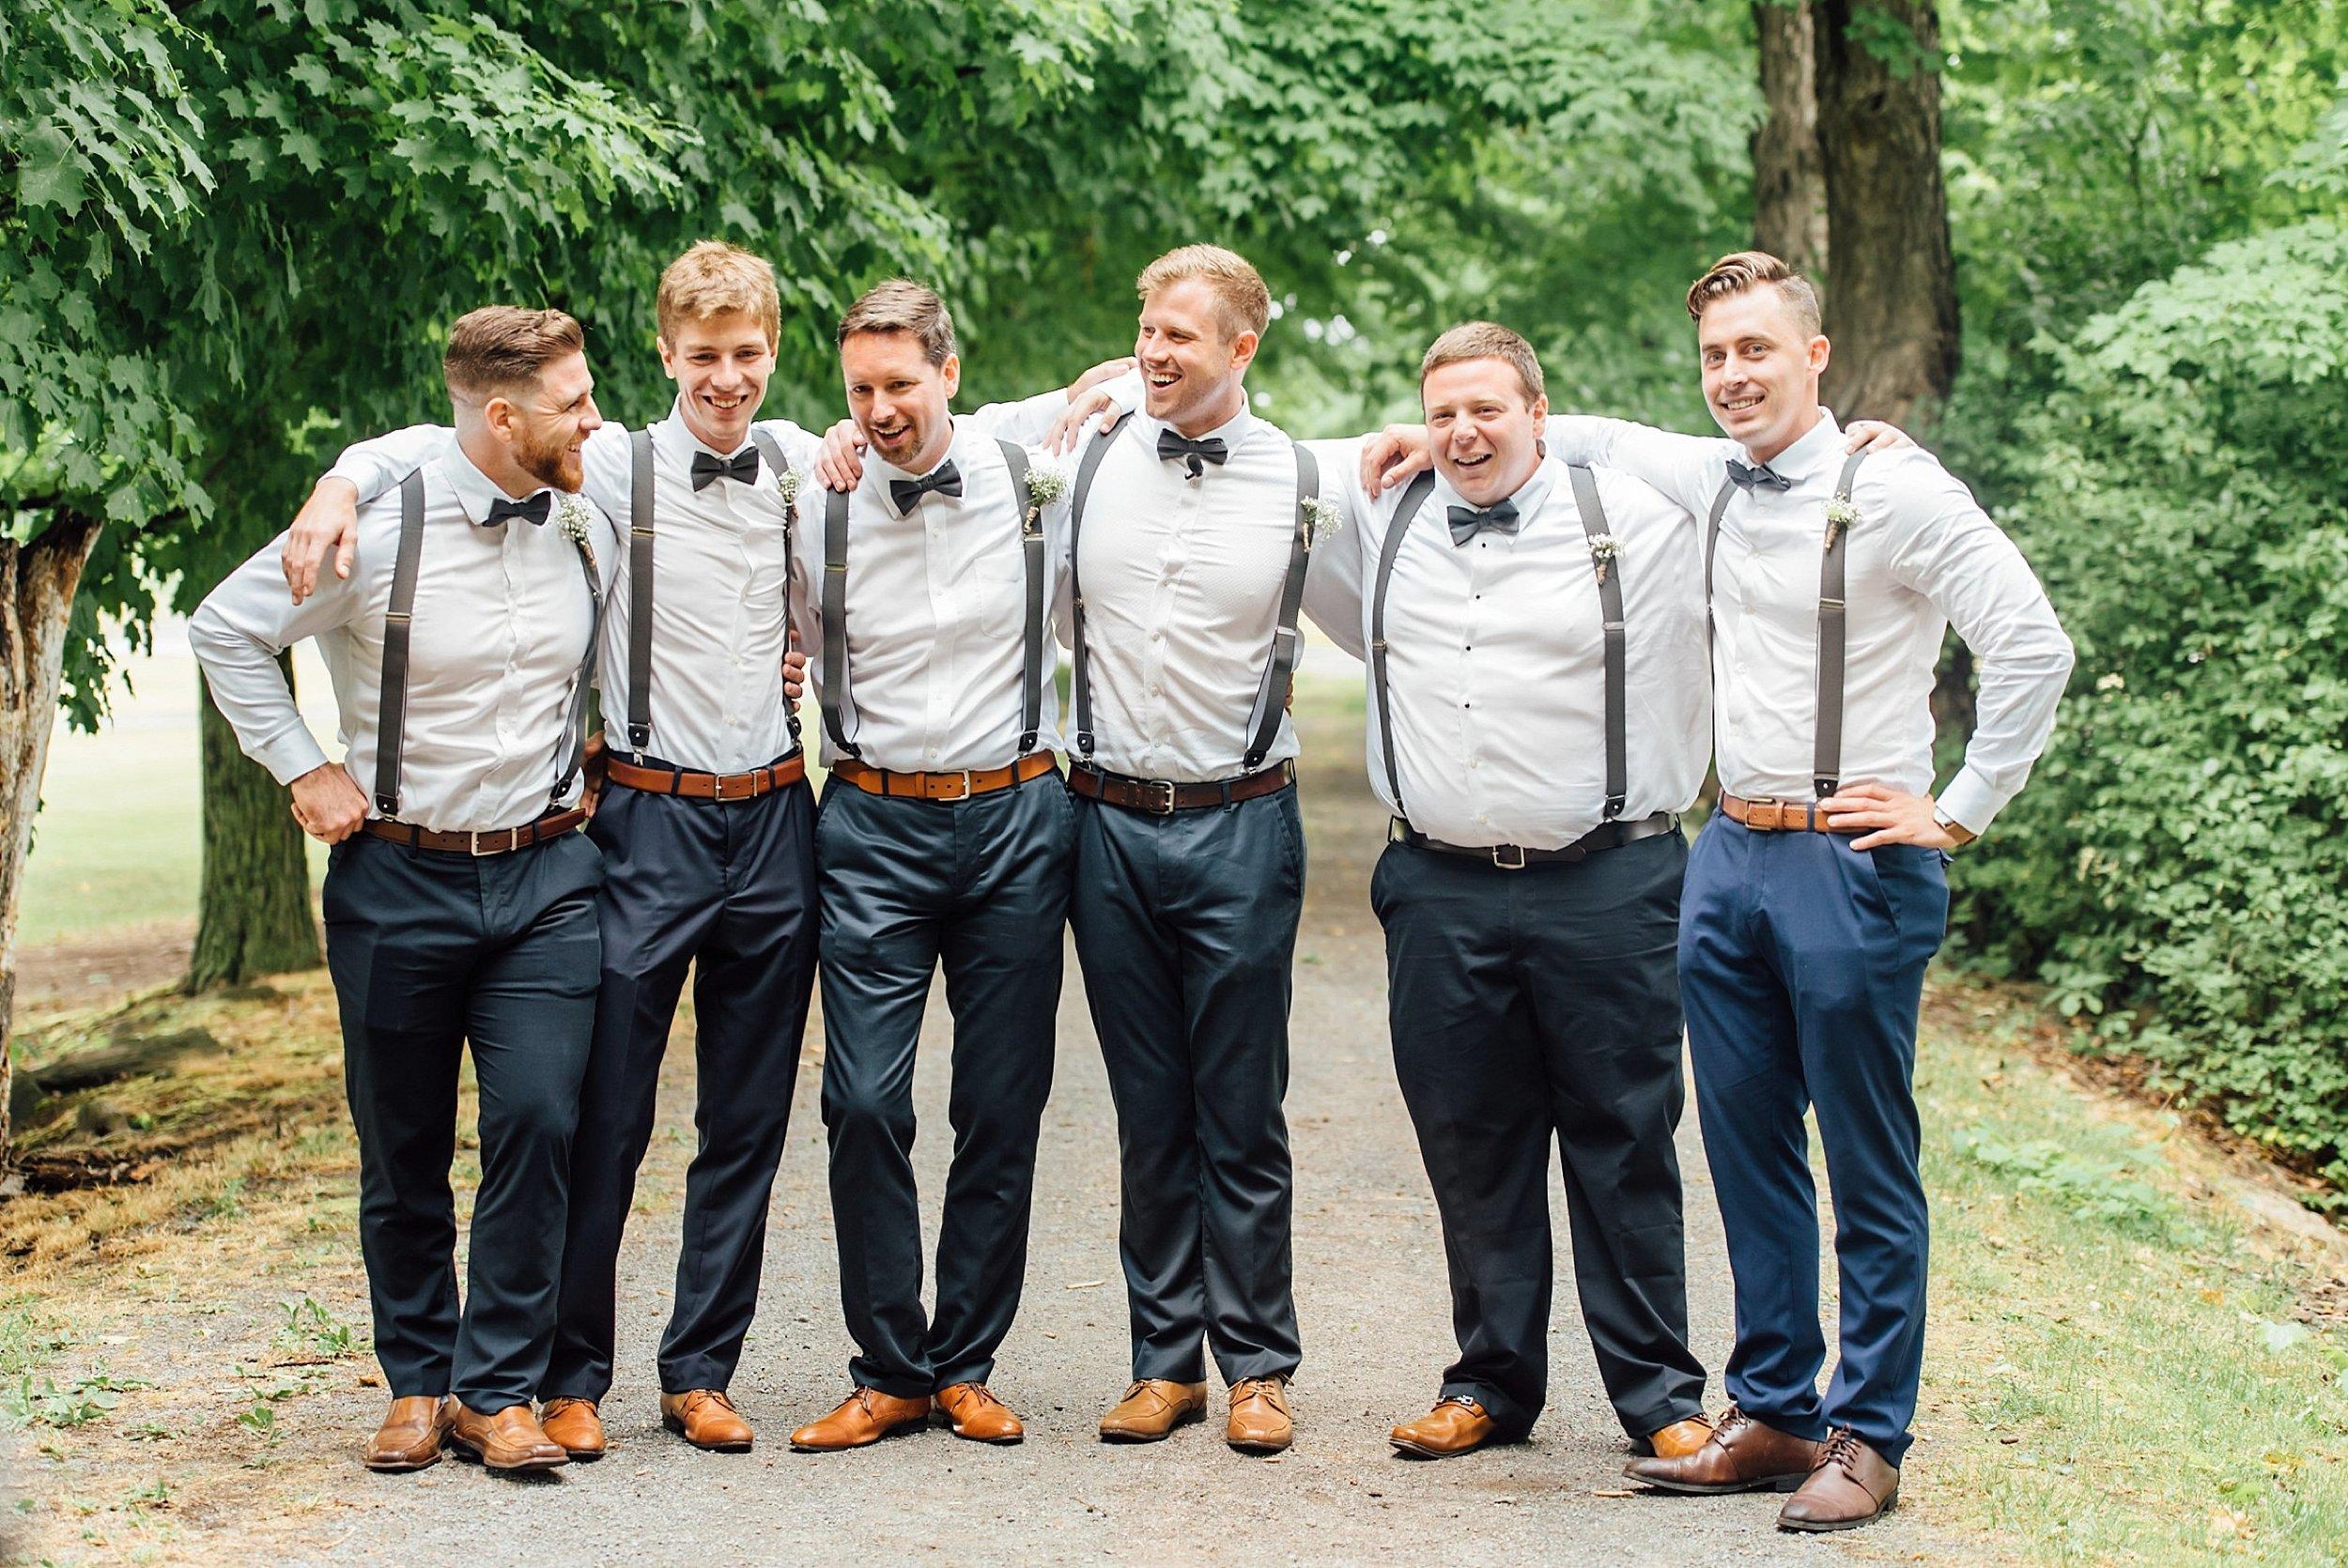 Ottawa Wedding Photographer - Stanley's Olde Maple Lane Barn Wedding - Ali & Batoul Photography_0047.jpg